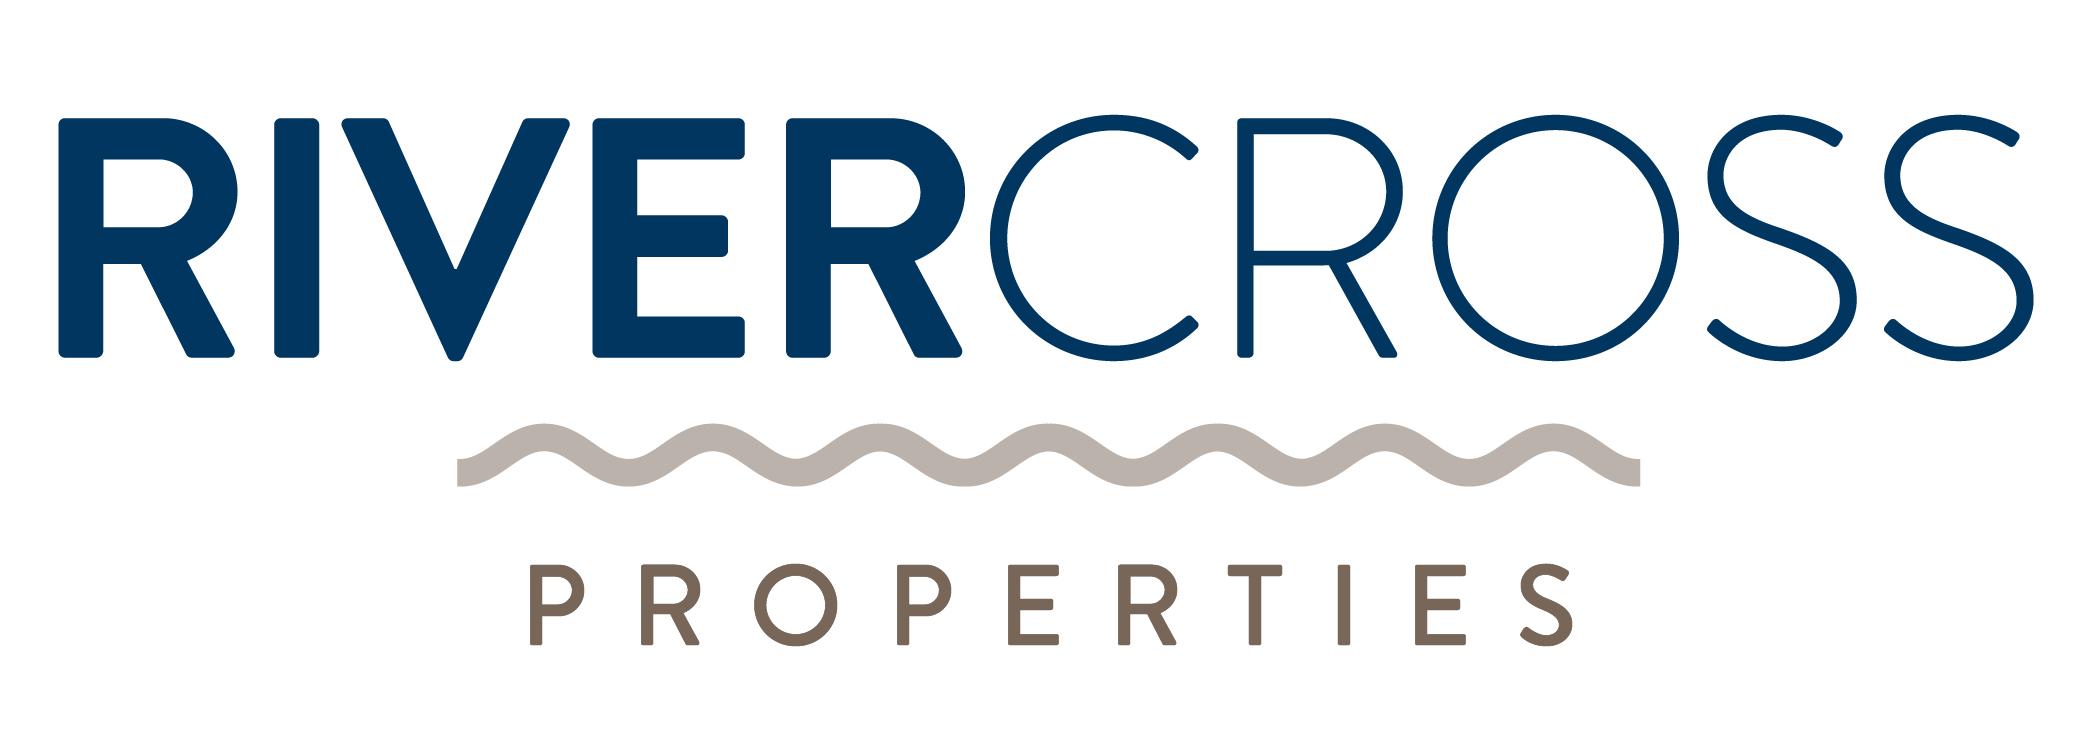 River Cross Properties Logo